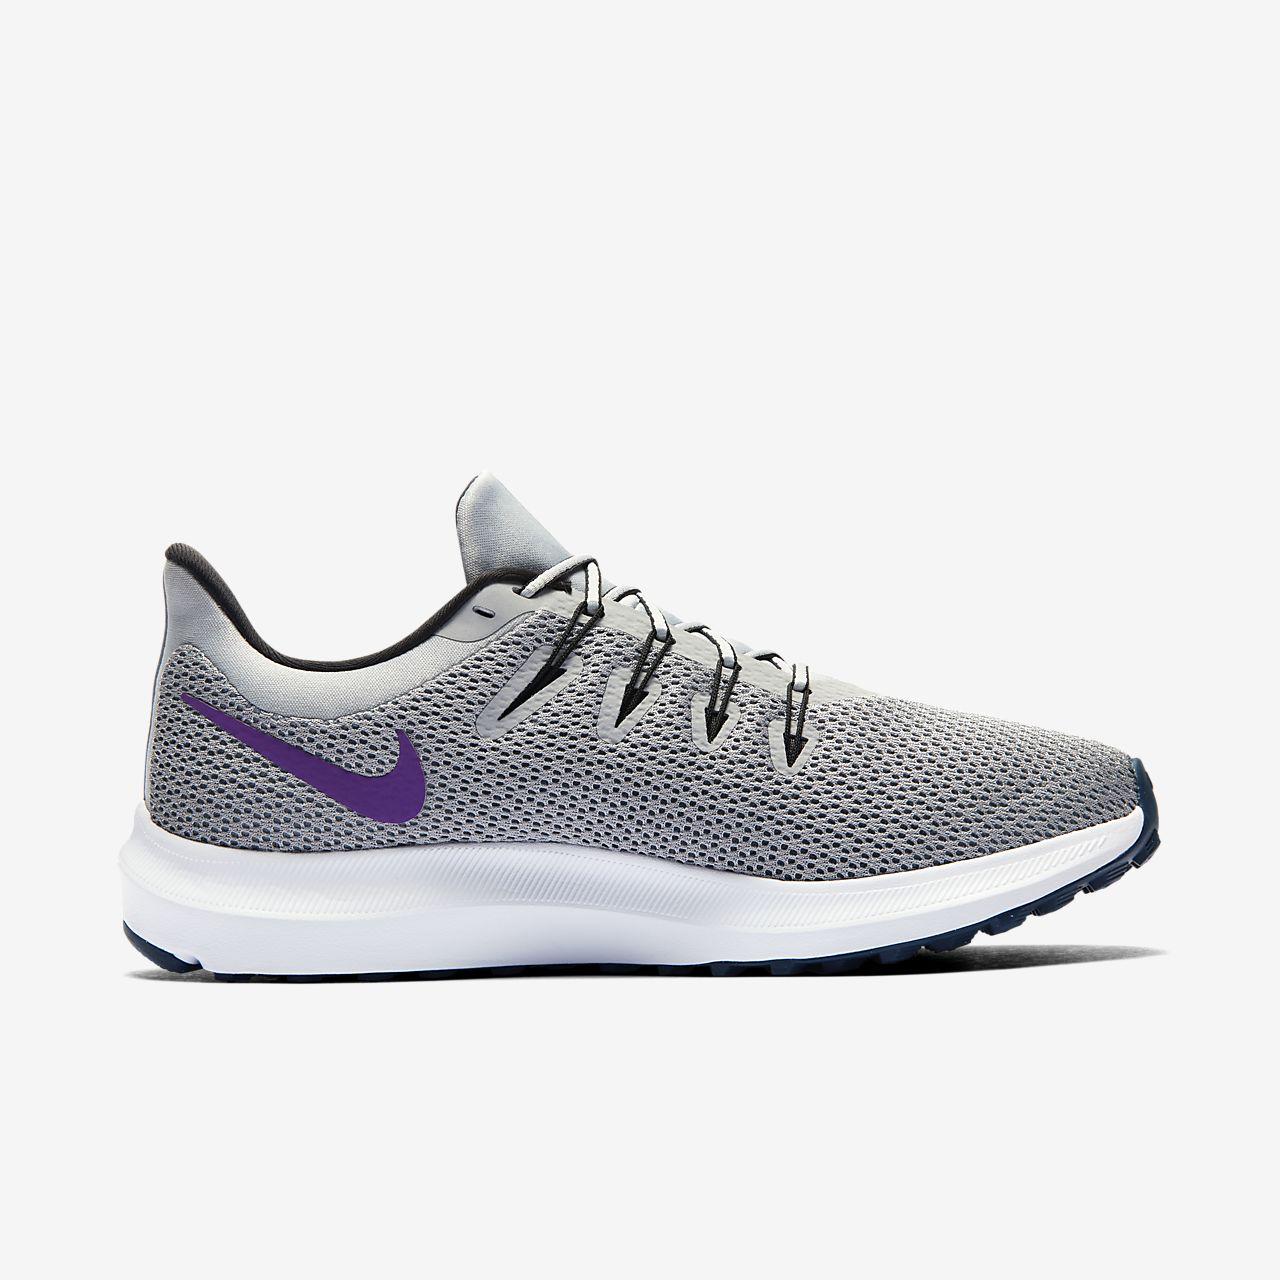 Großhandelspreis Nike Sportswear Neonorange Tanjun, nike